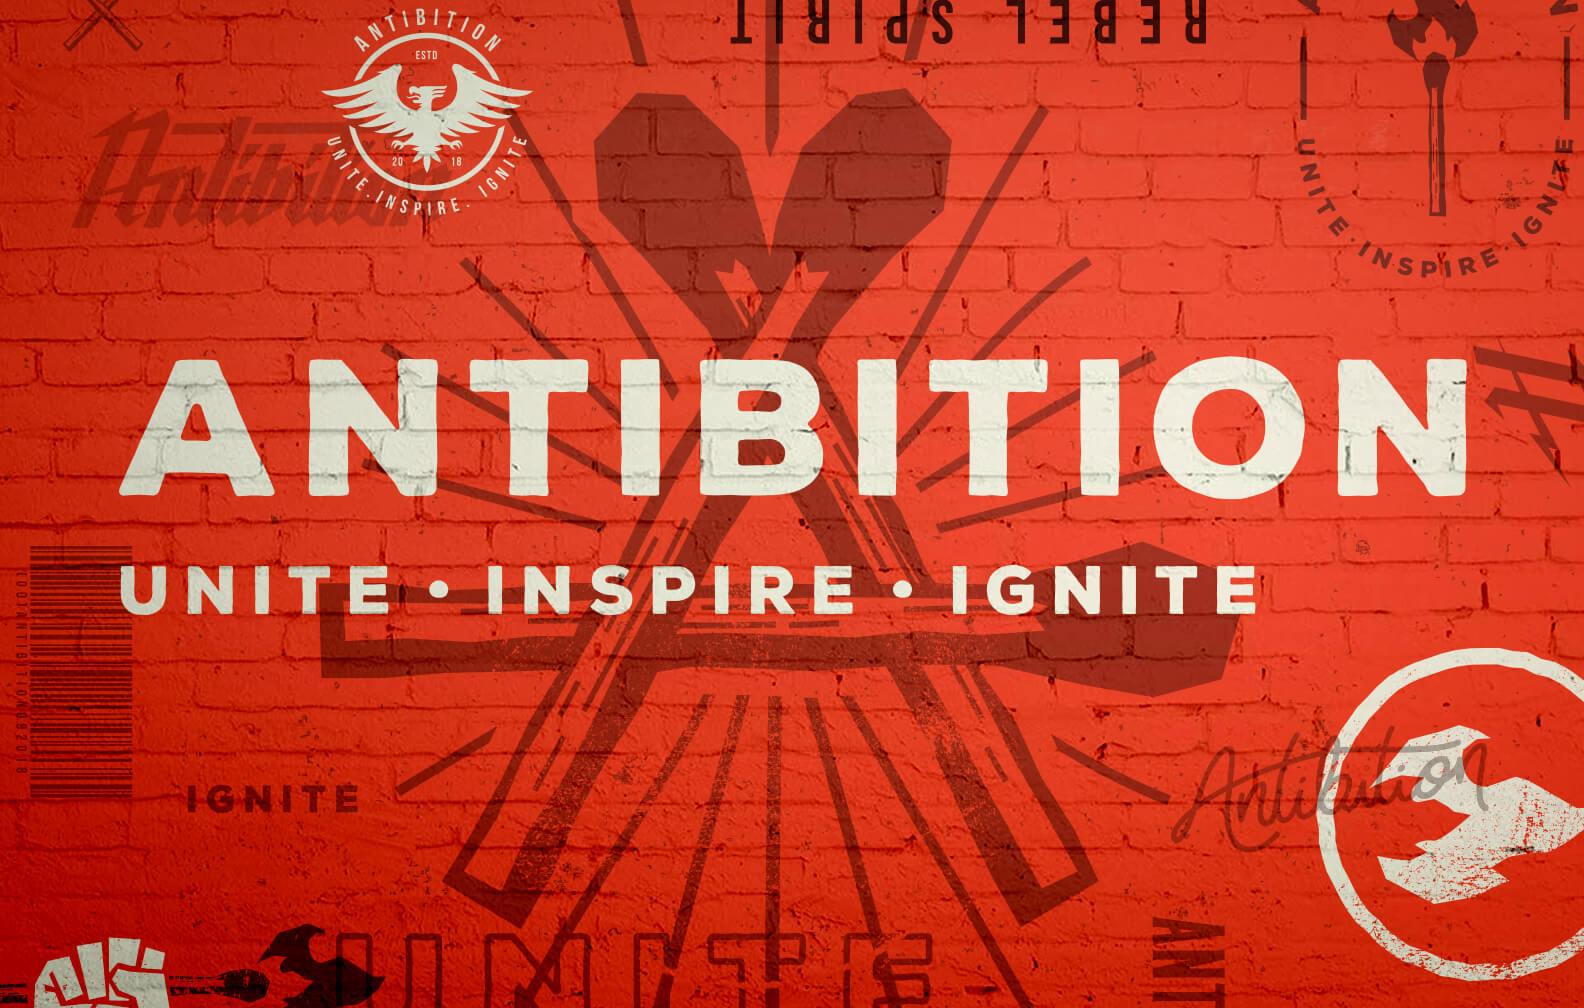 Antibition